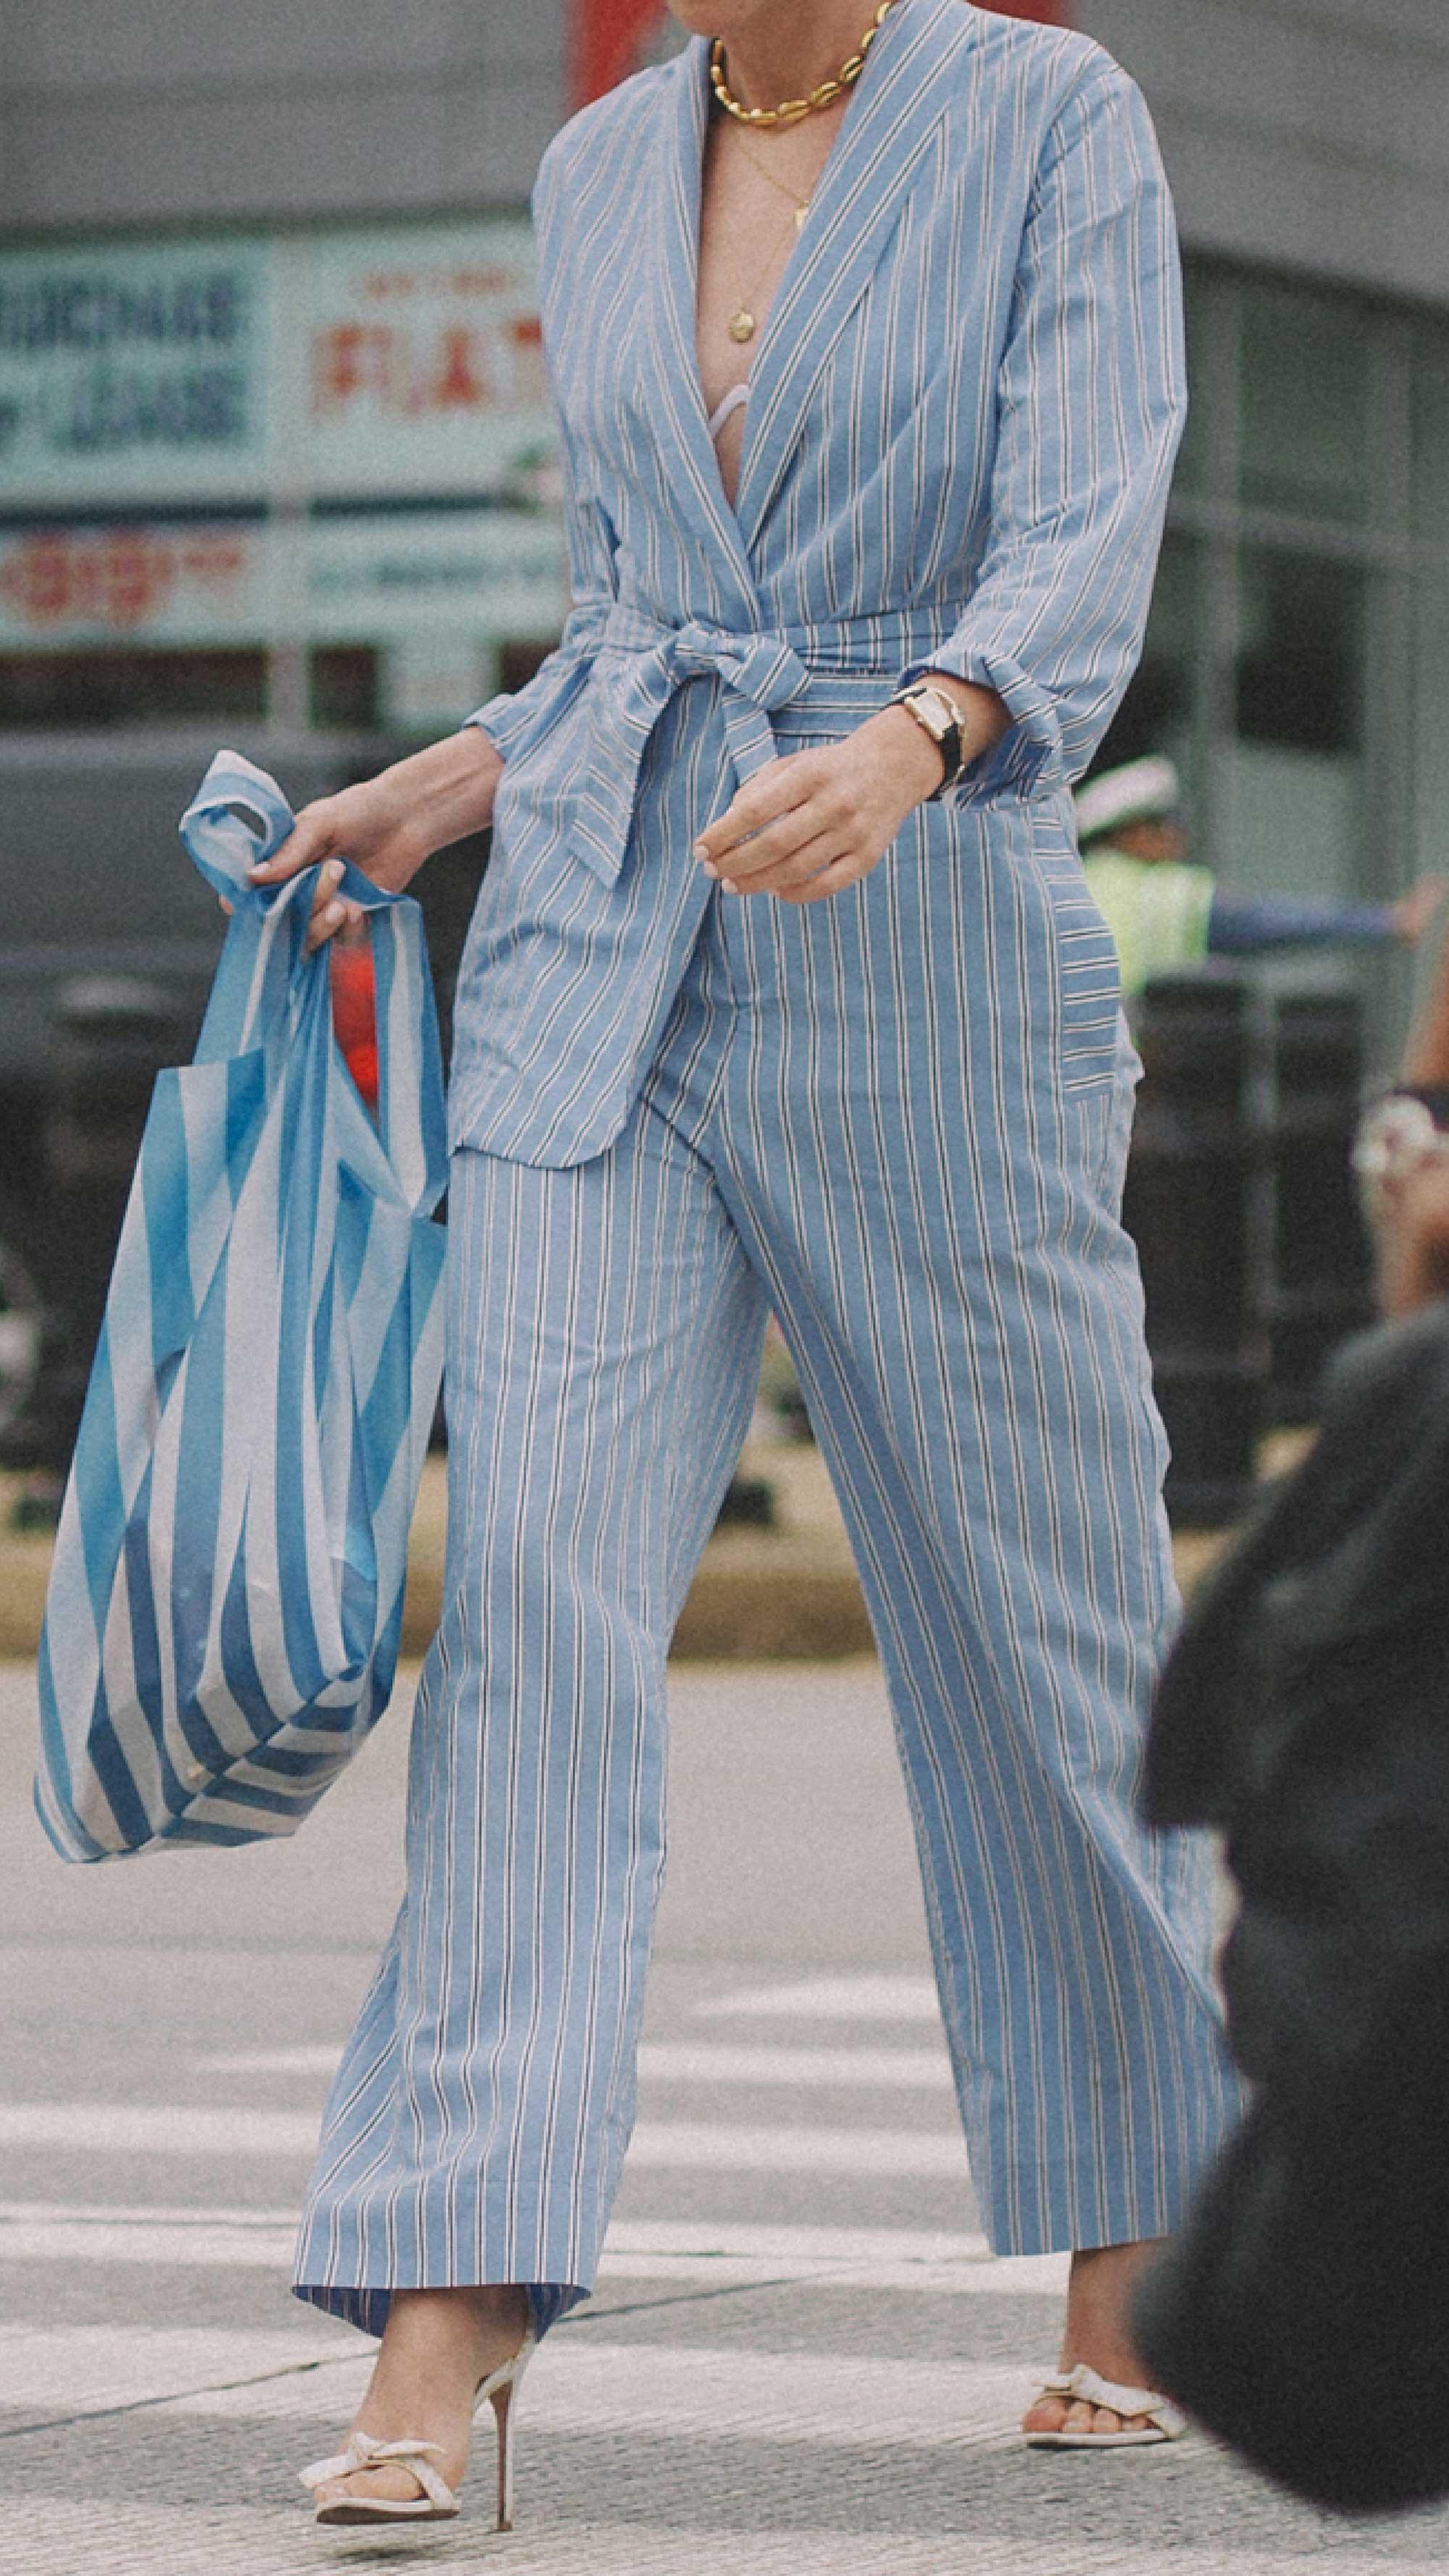 New-York-Fashion-Week-NYFW-SS18-street-style-day-five-SS18-15.jpg